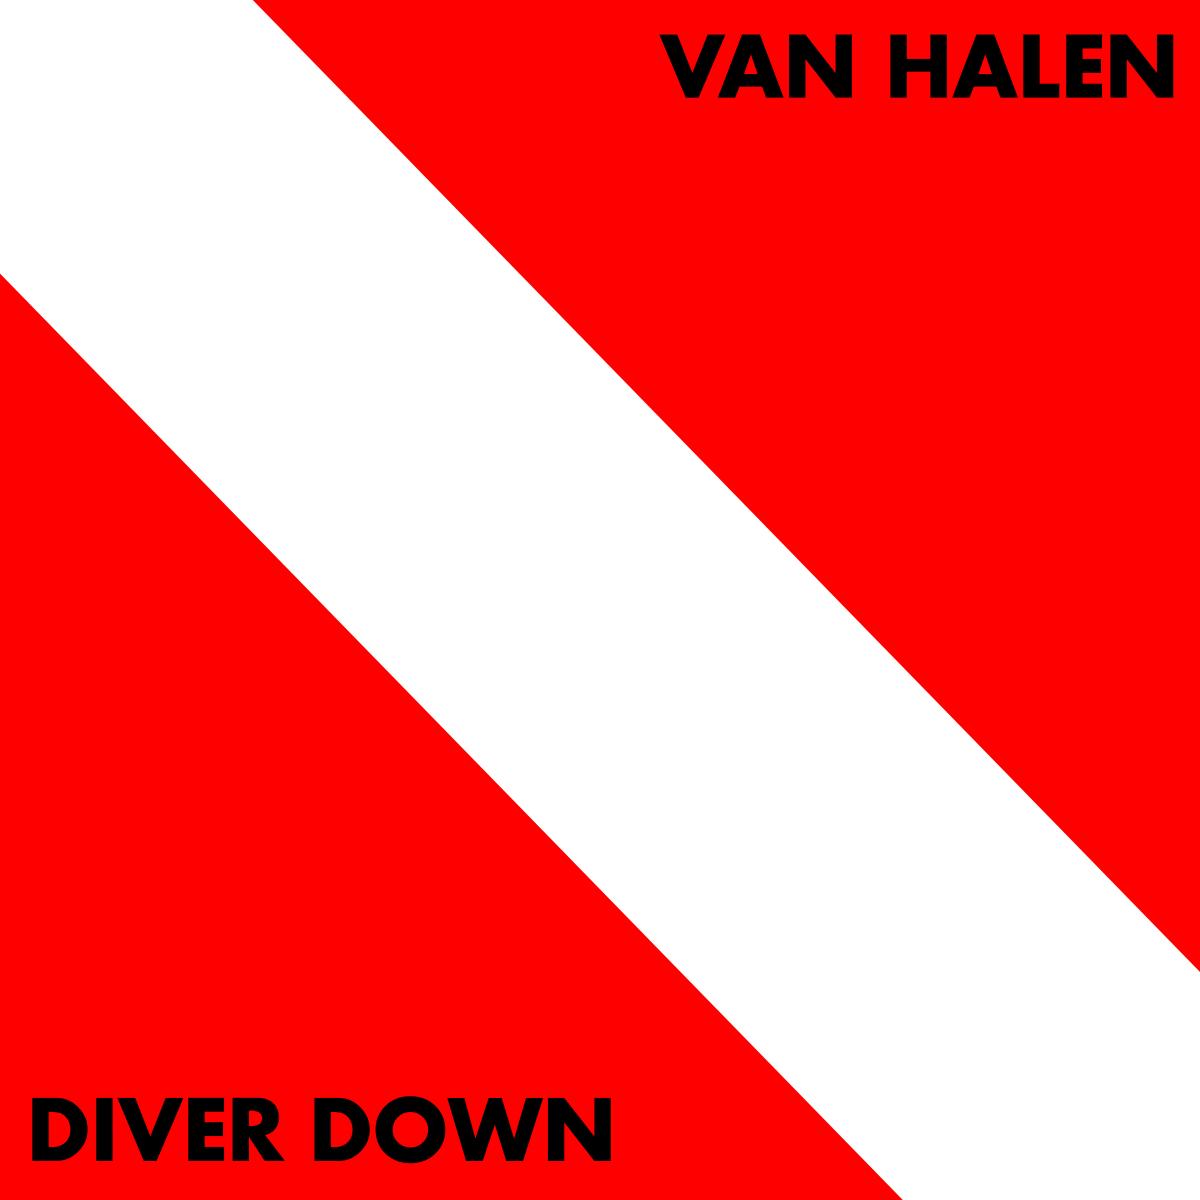 Art for Little Guitars by Van Halen